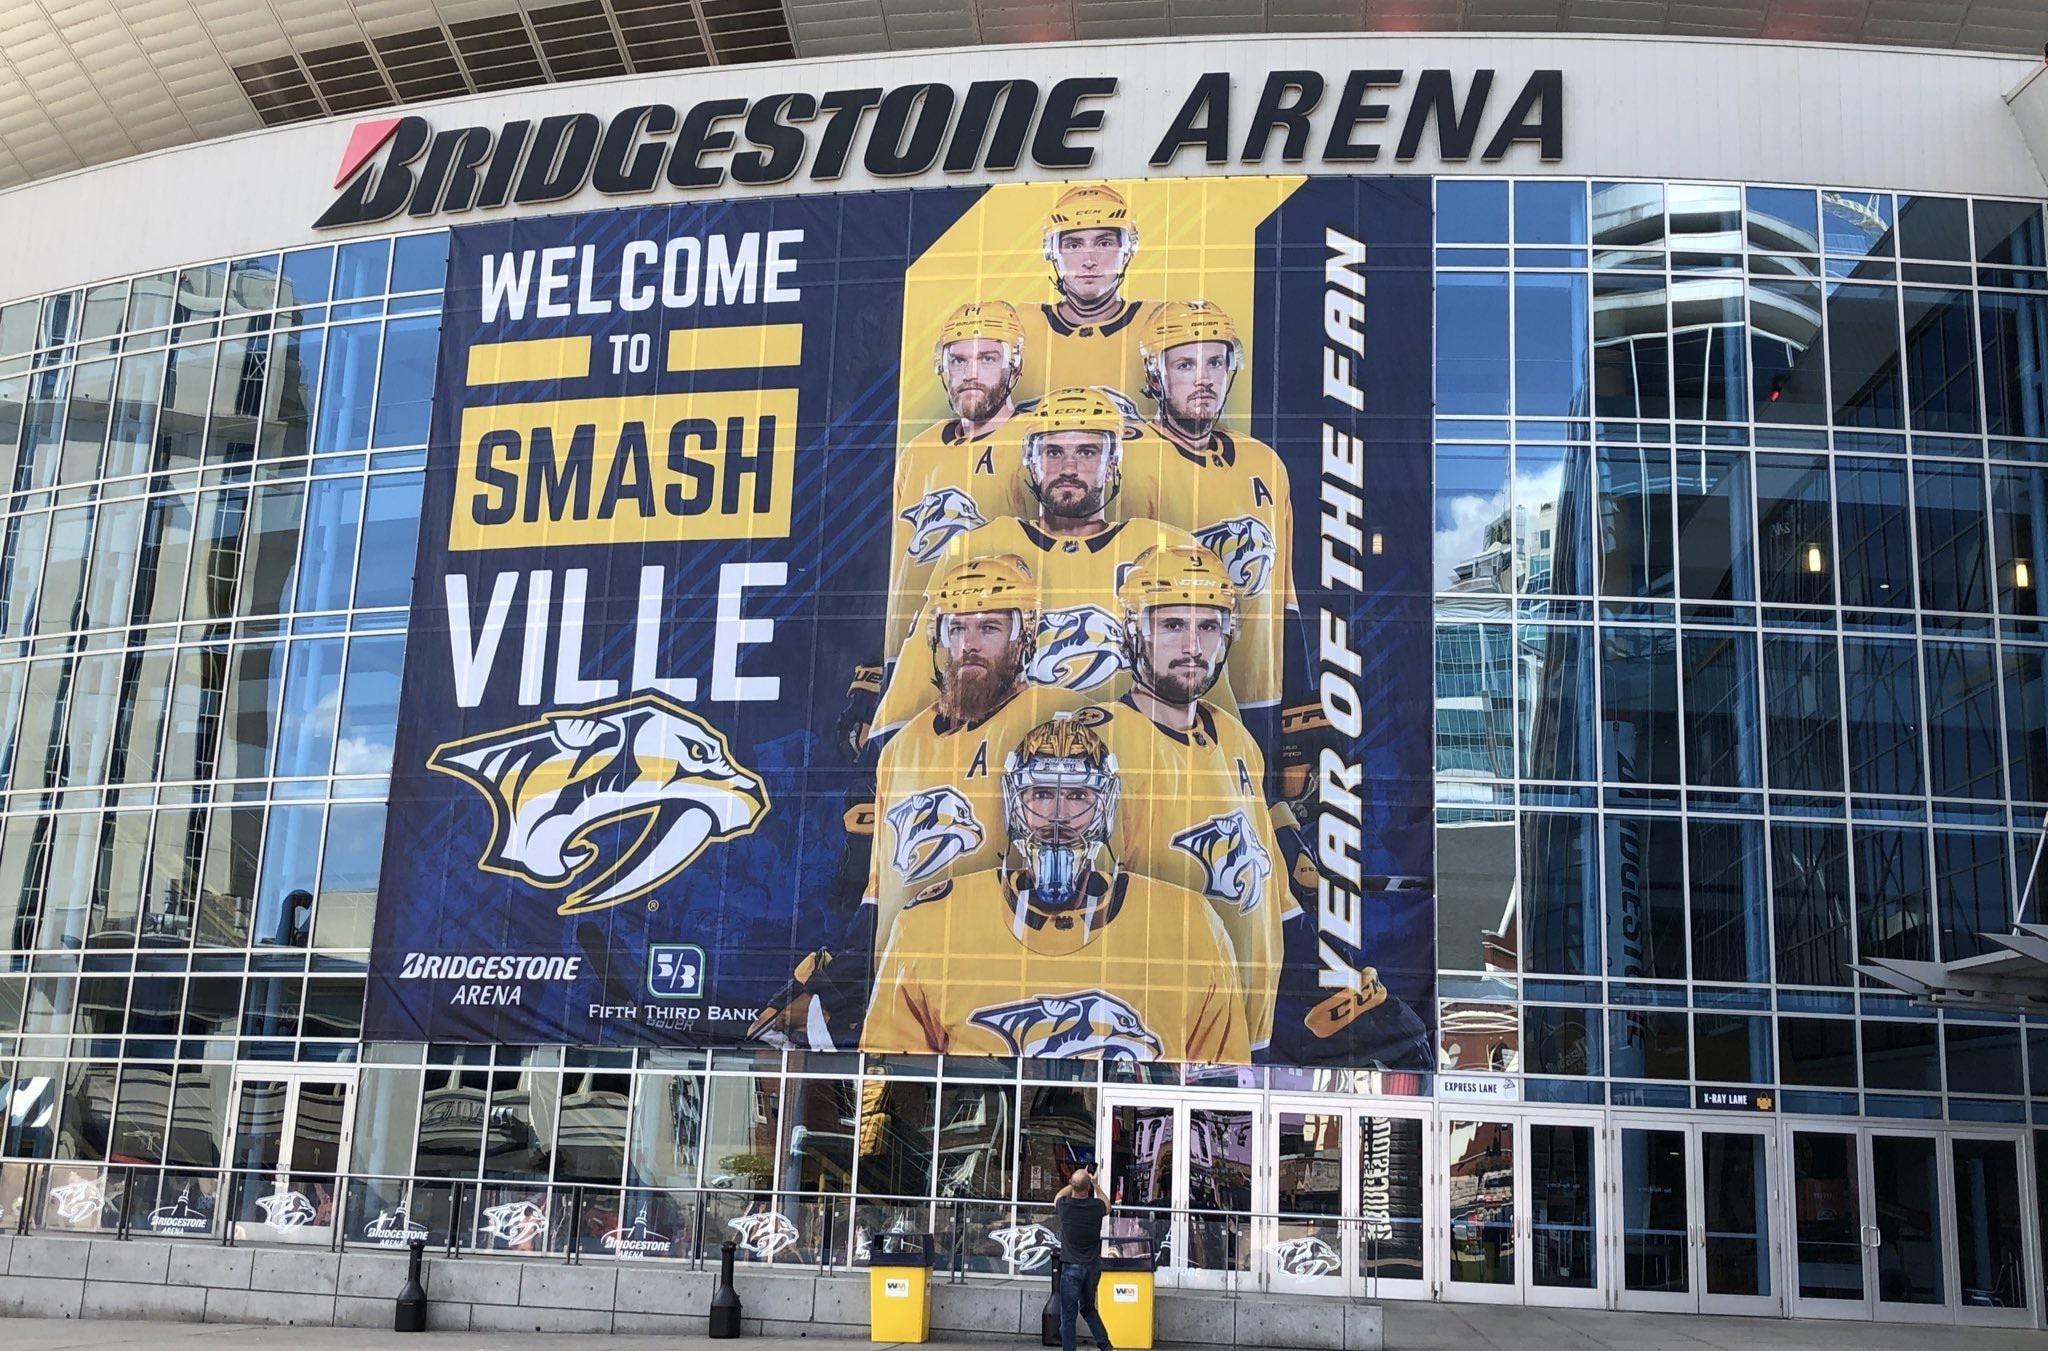 Una vista esterna della Bridgestone Arena